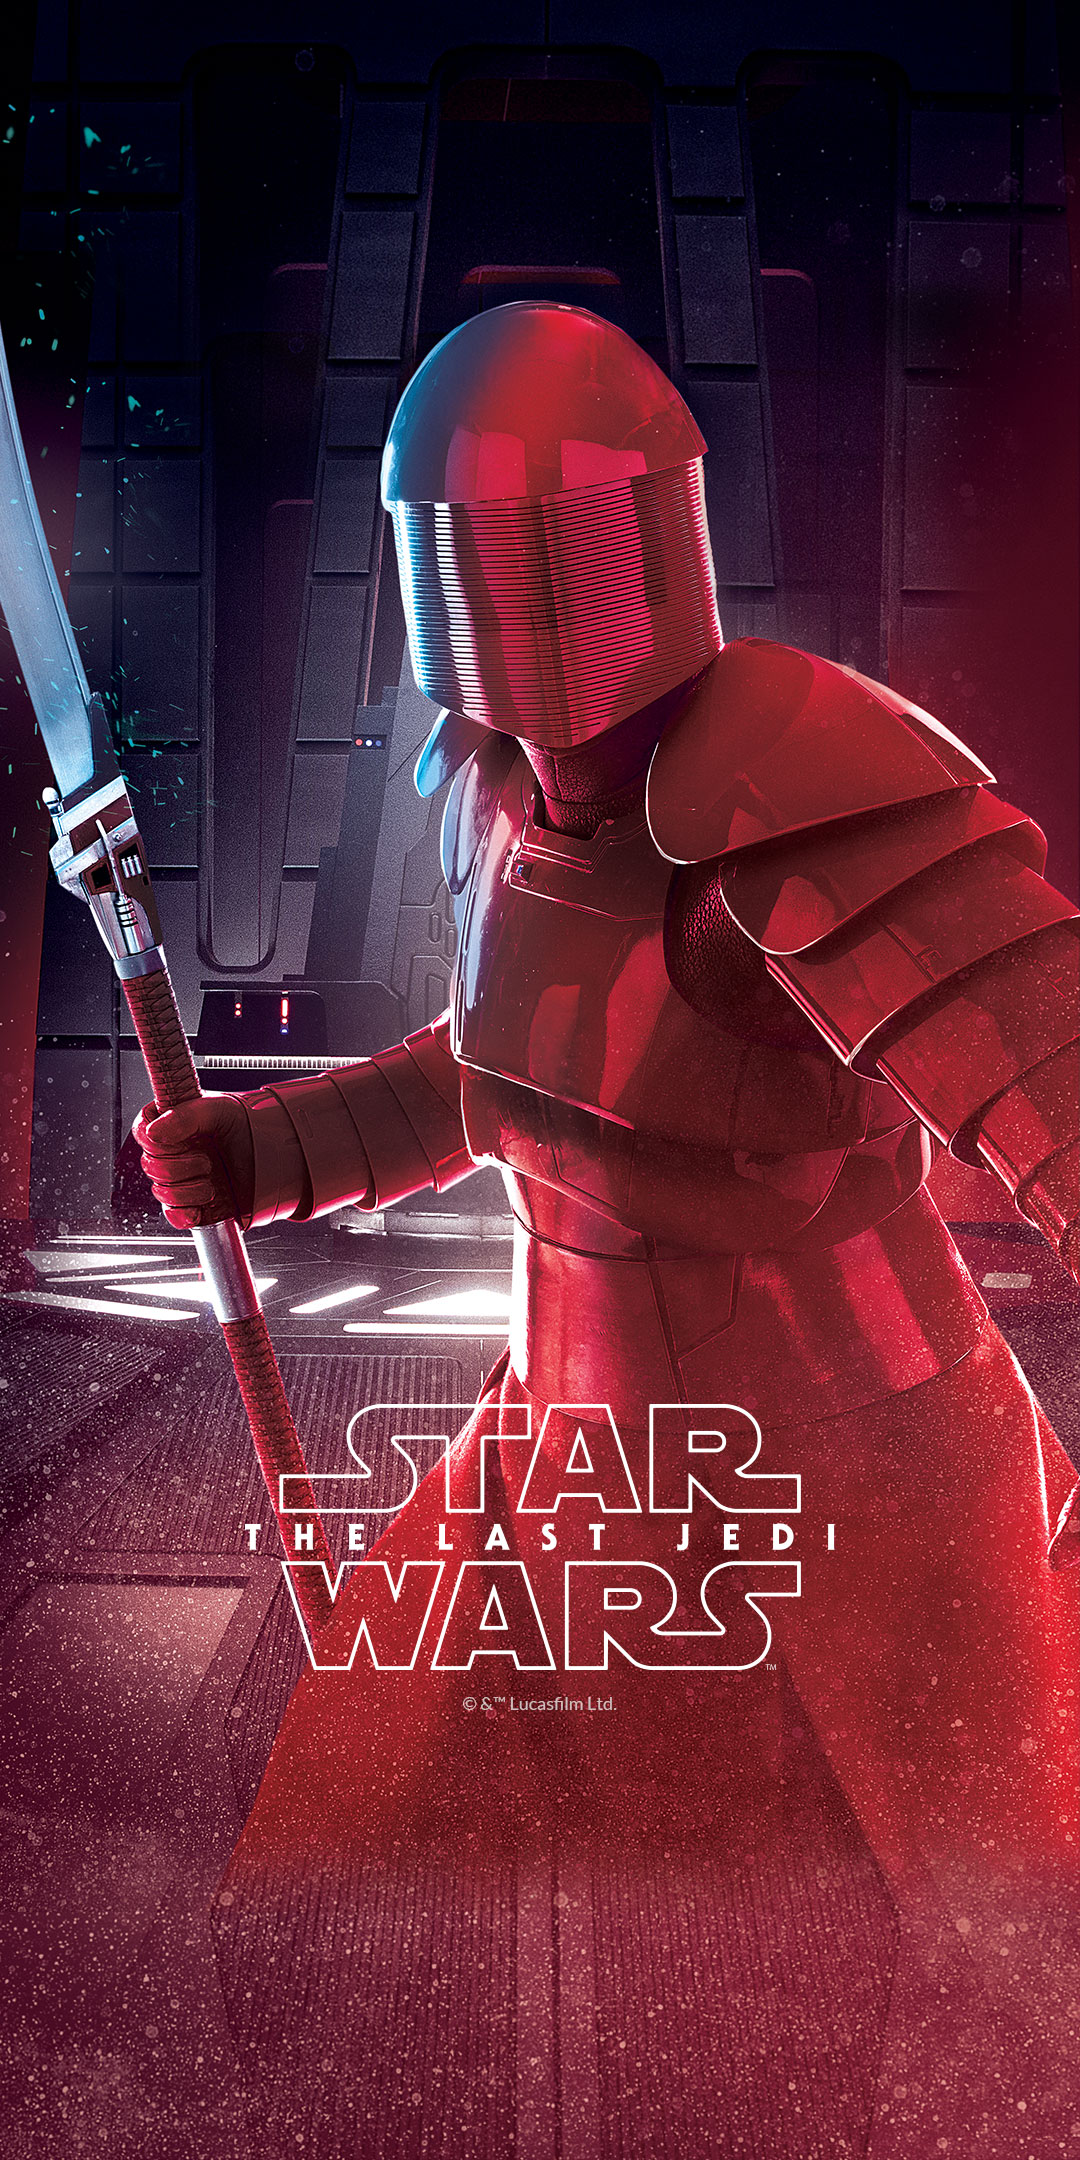 Star Wars The Last Jedi Wallpaper 4k Posted By Sarah Peltier